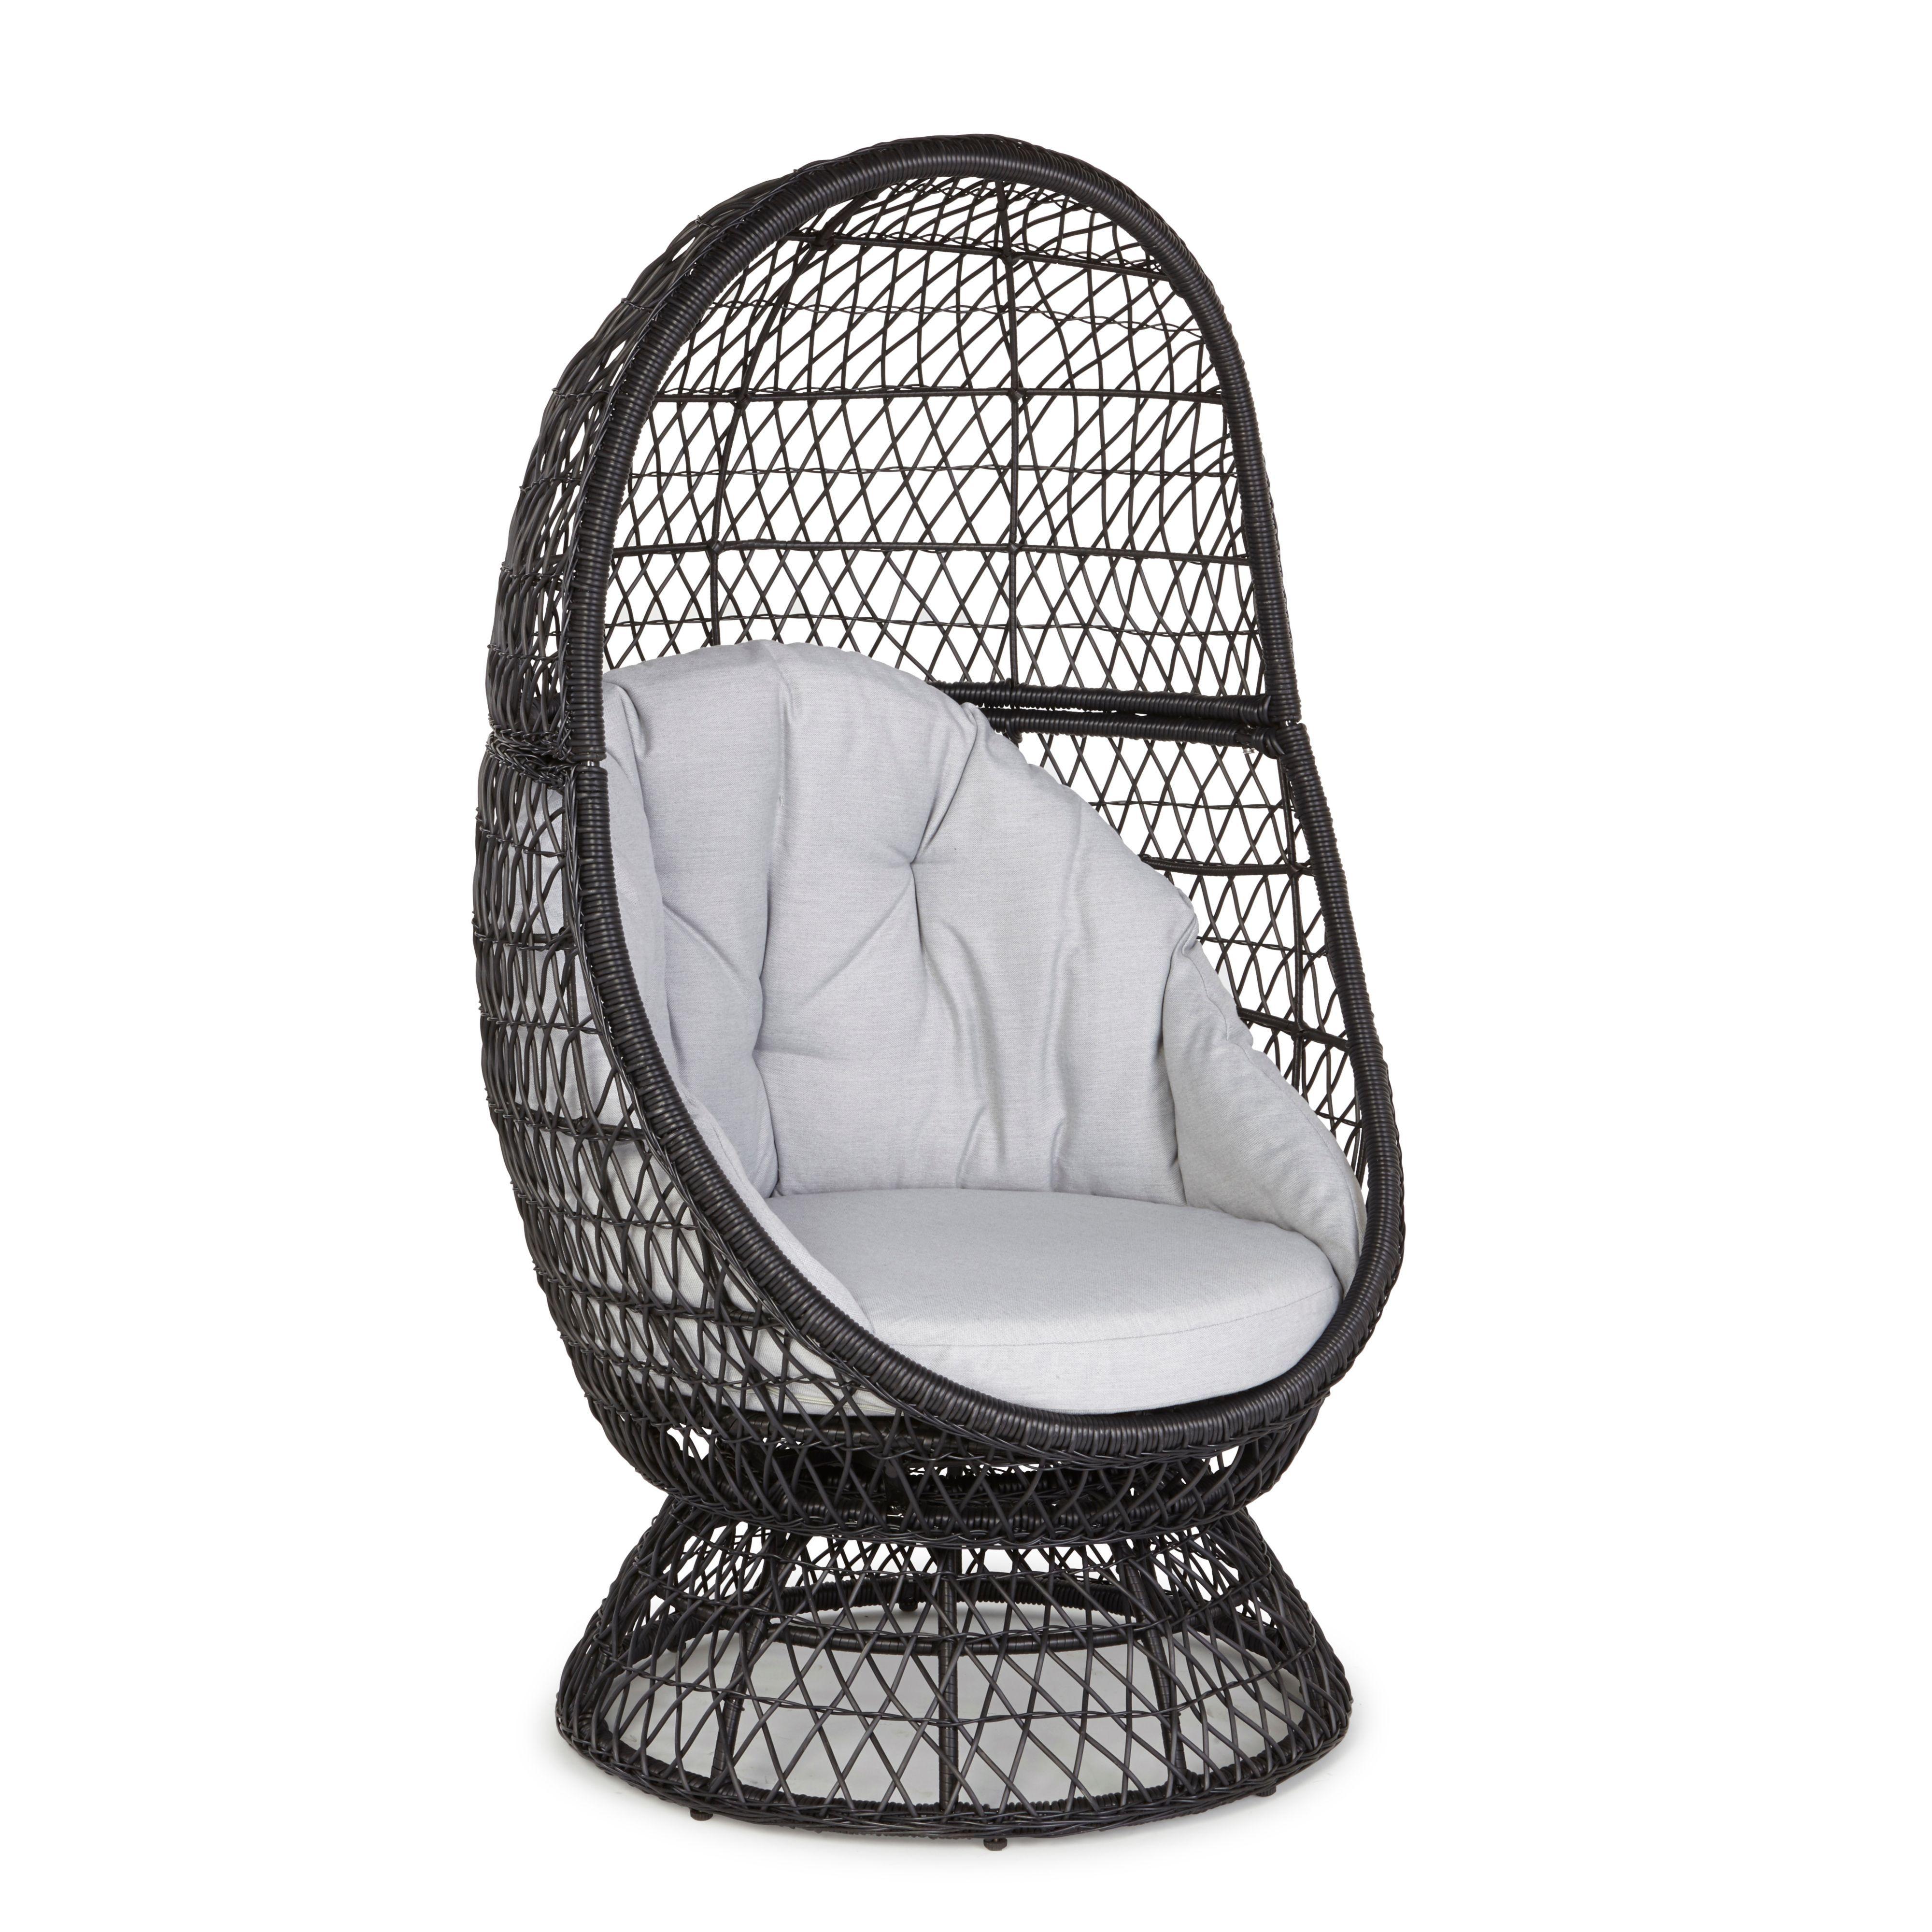 egg chair garden furniture